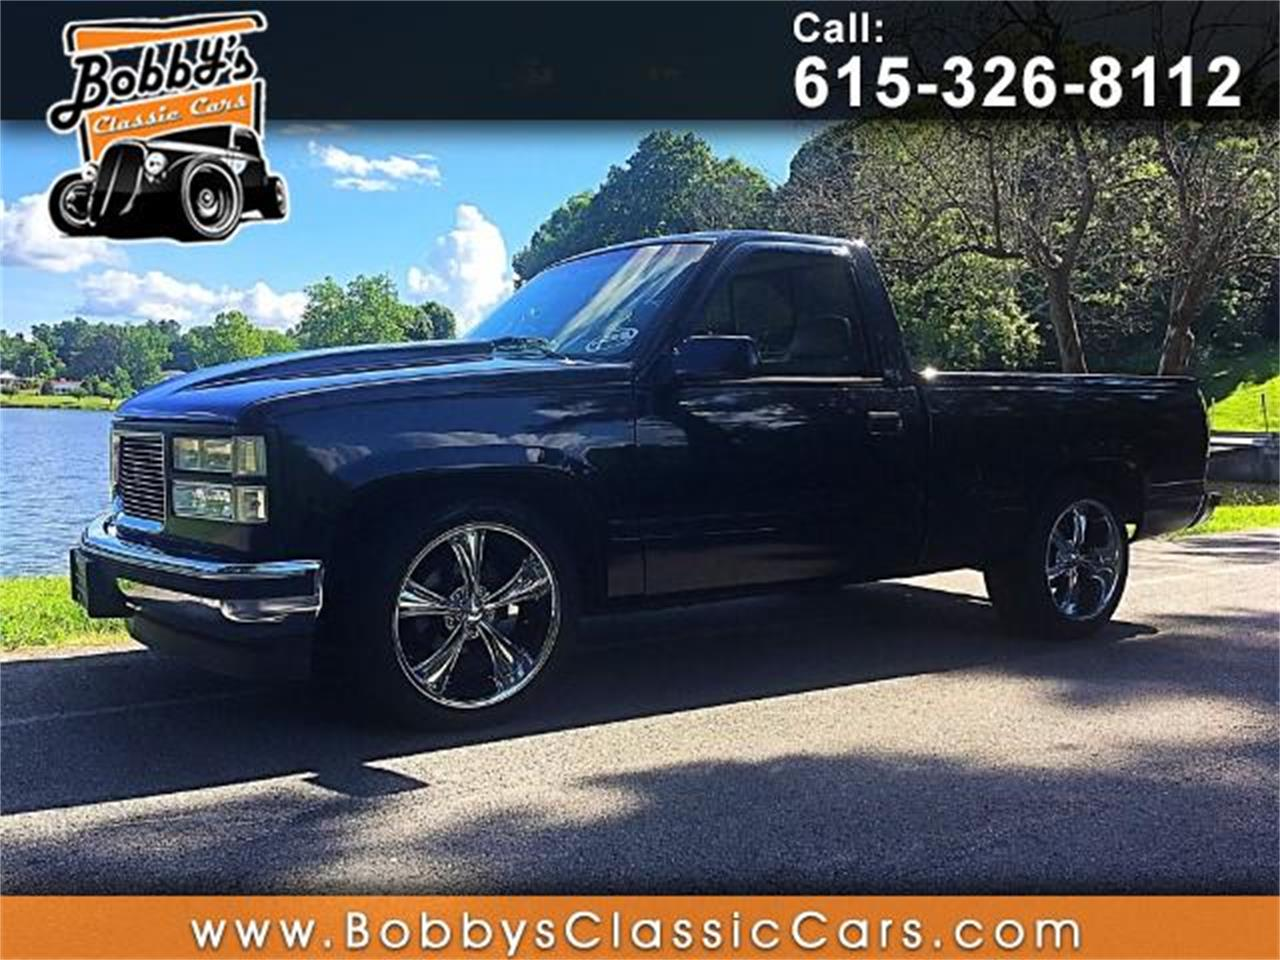 95 gmc pickup truck